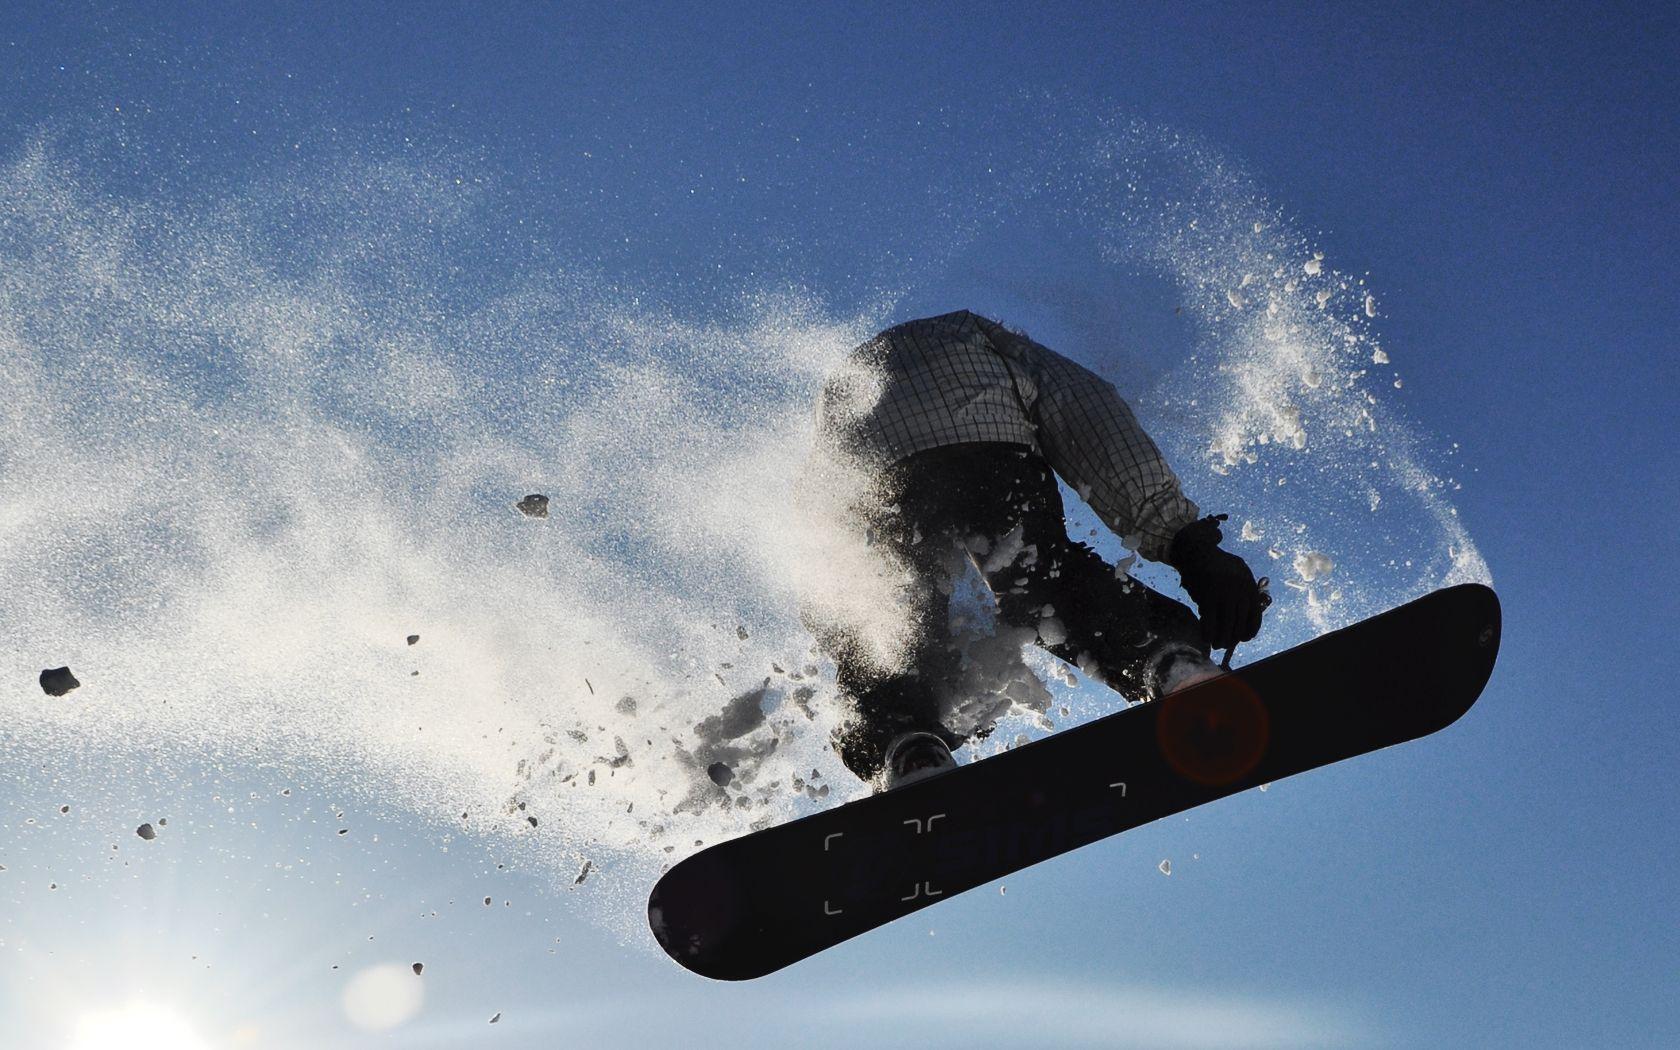 Snowboarding Fresh New Hd Wallpaper Jpg 1680 1050 Snowboarding Snow Surfing Sports Wallpapers